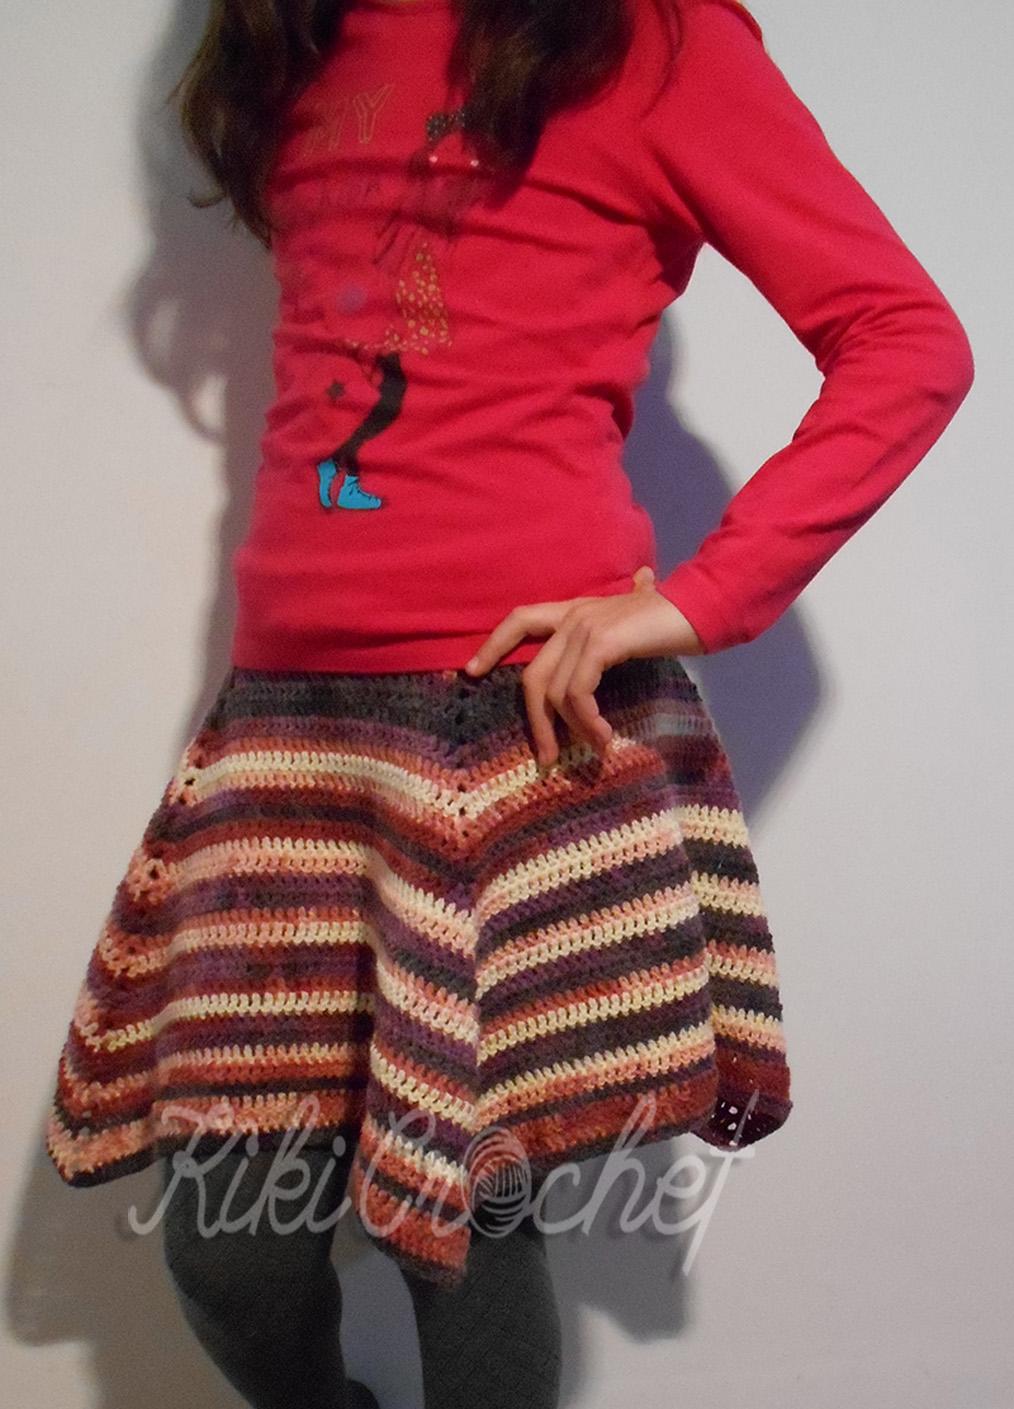 a1ed361456bf Υλικα απο το καταστημα 1000   1 Plexis  1) Τρεισημισι κουκλες Alize  Superlana Klasik Batik 2) Βελονακι 4